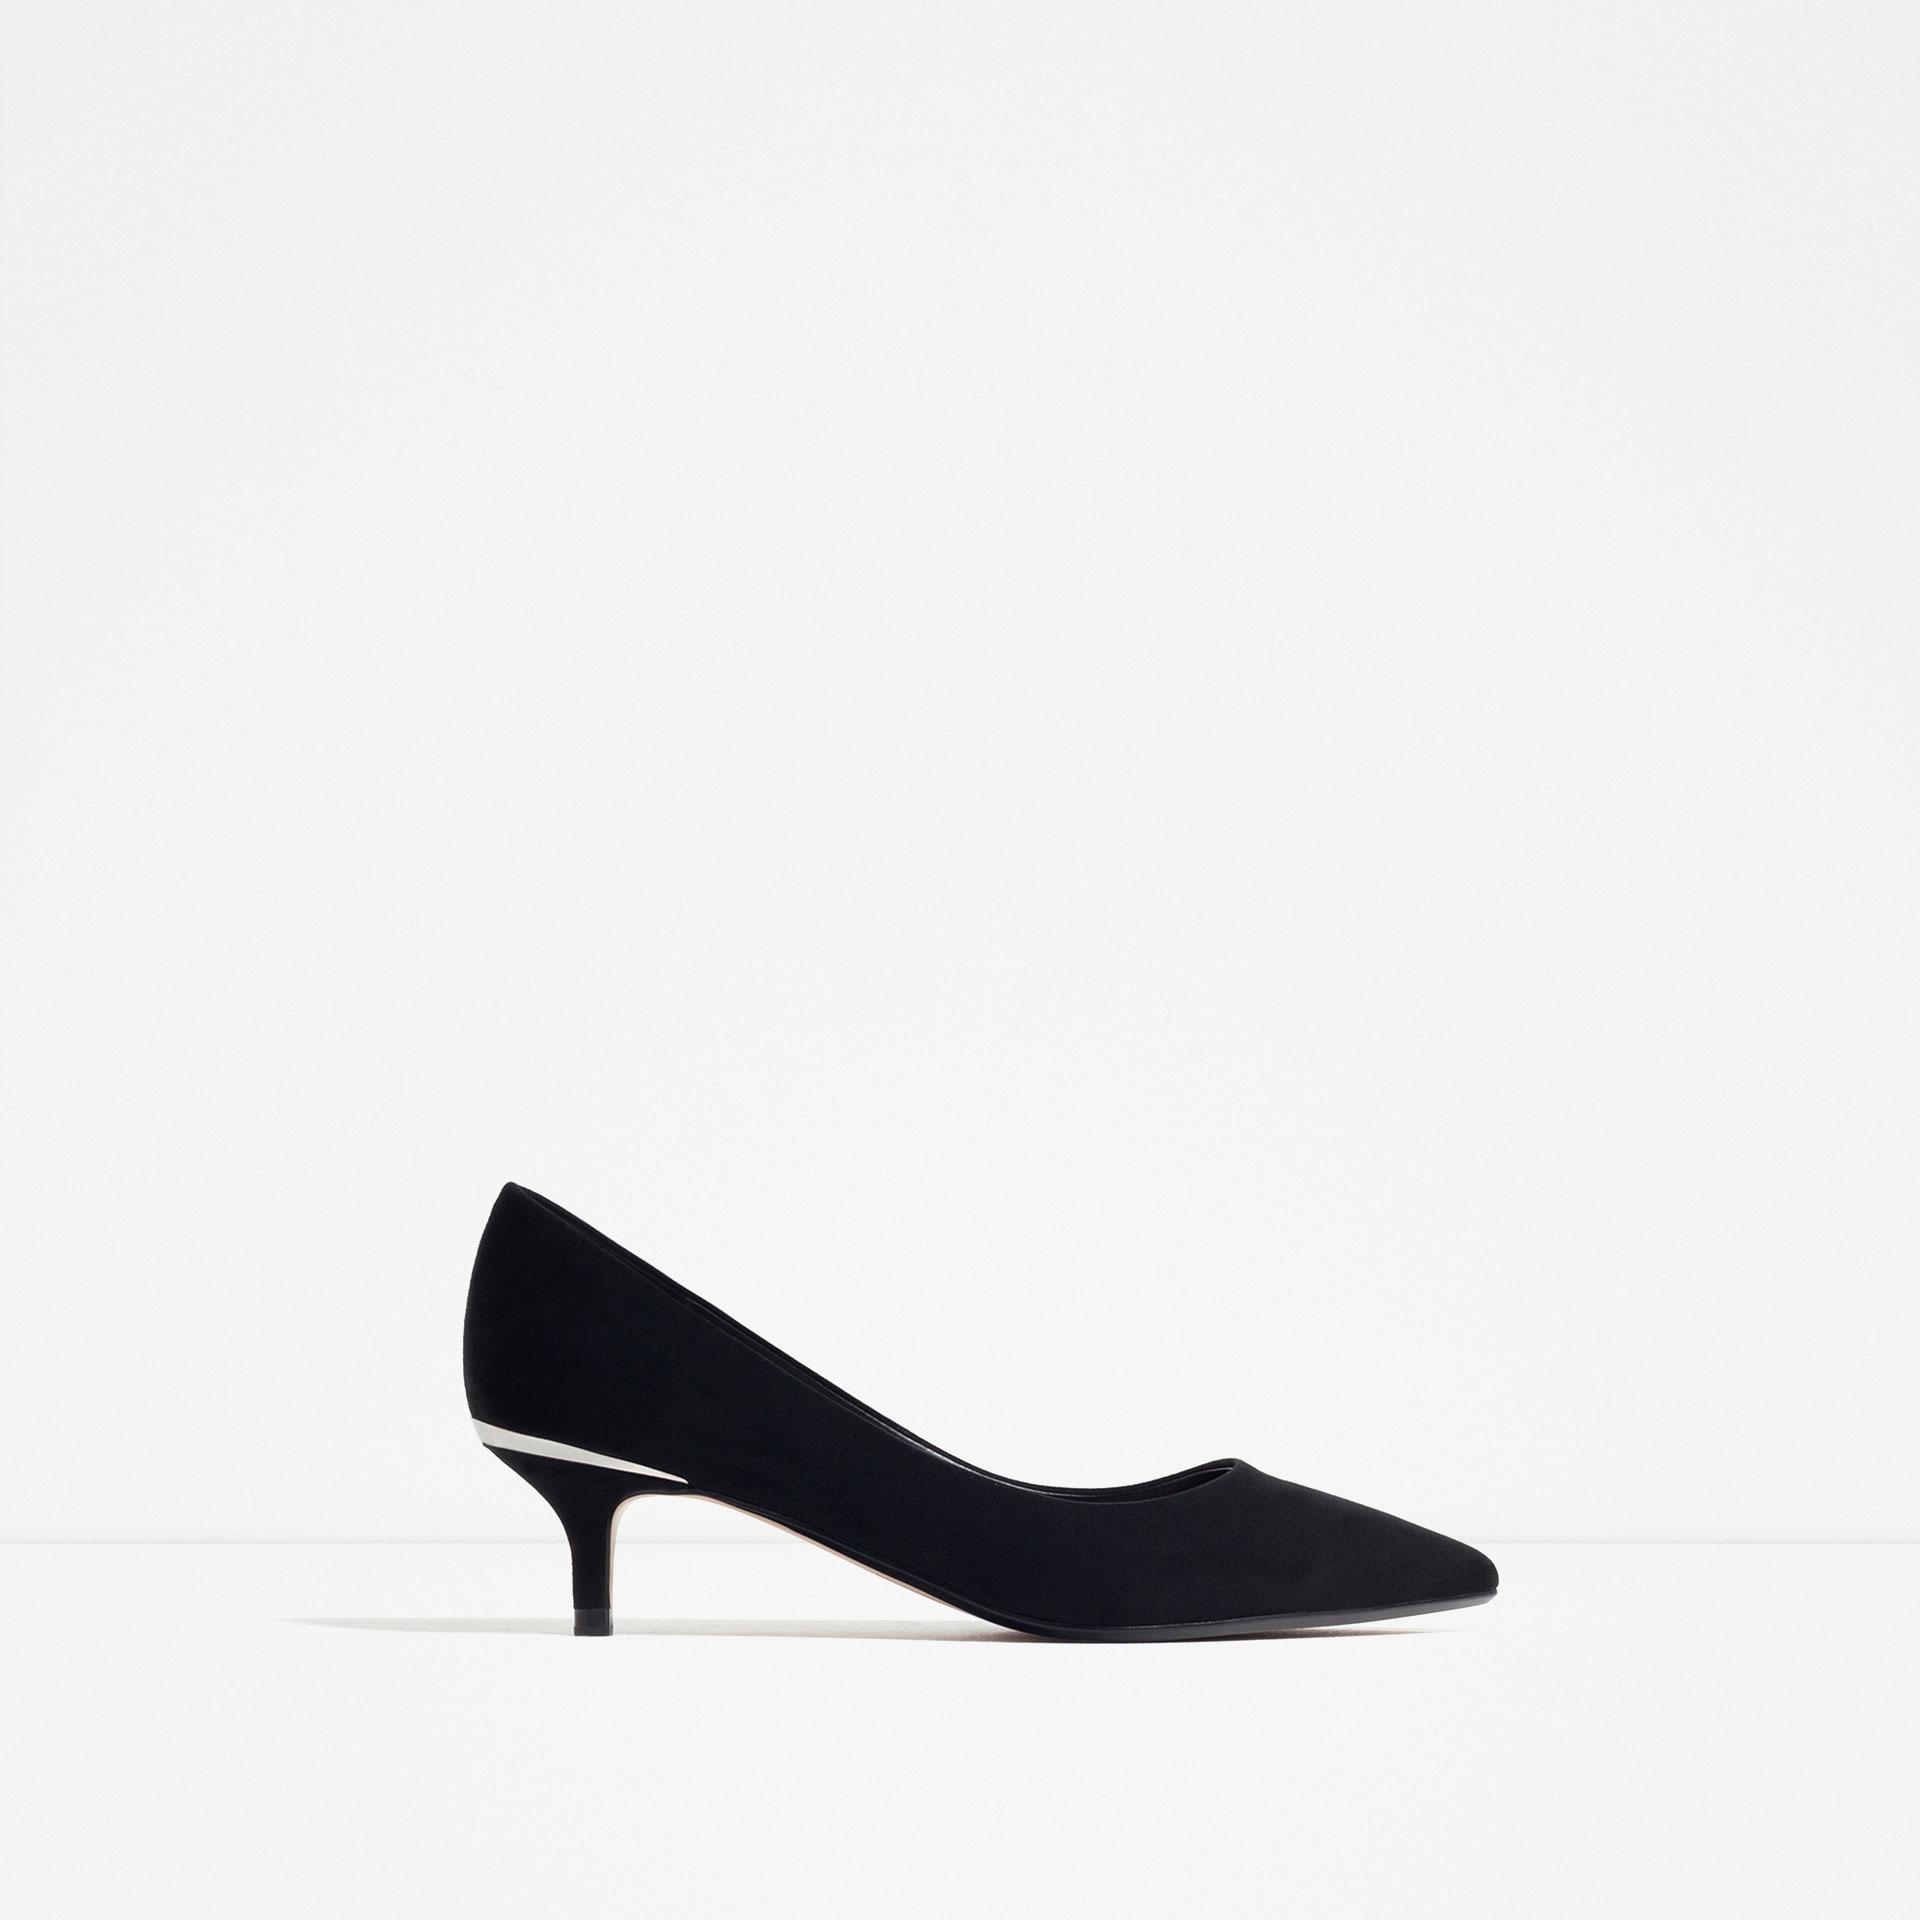 Zara Mid-heel Shoes With Metallic Detail in Black | Lyst